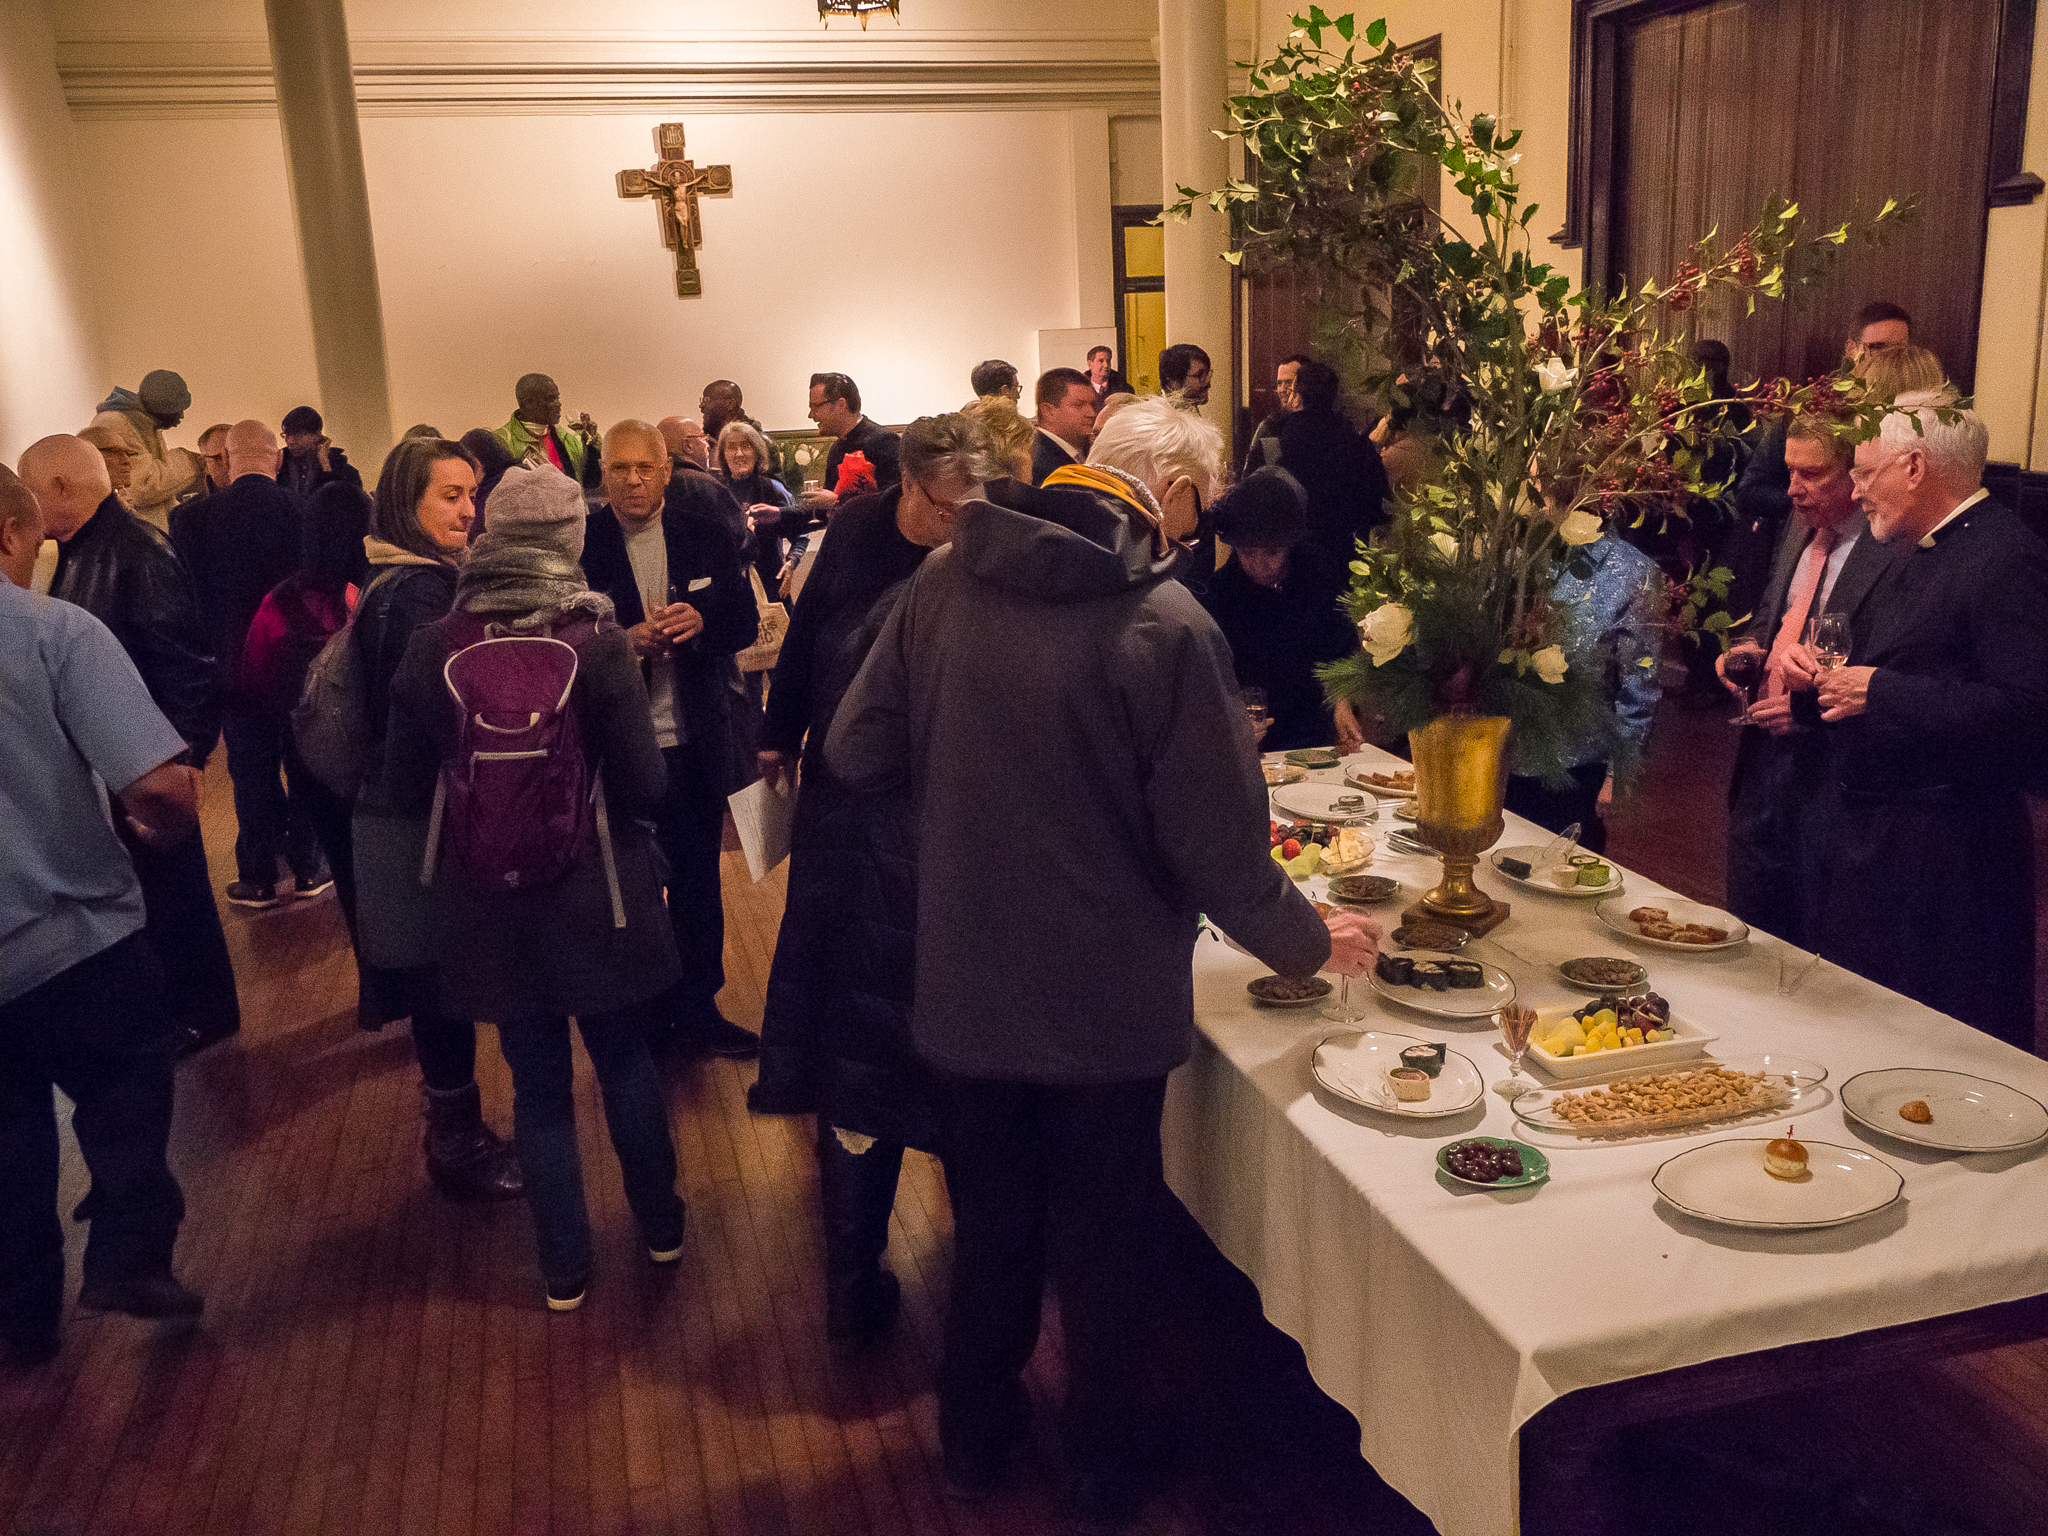 Reception after Solemn Mass on December 8 Photo: Ricardo Gomez